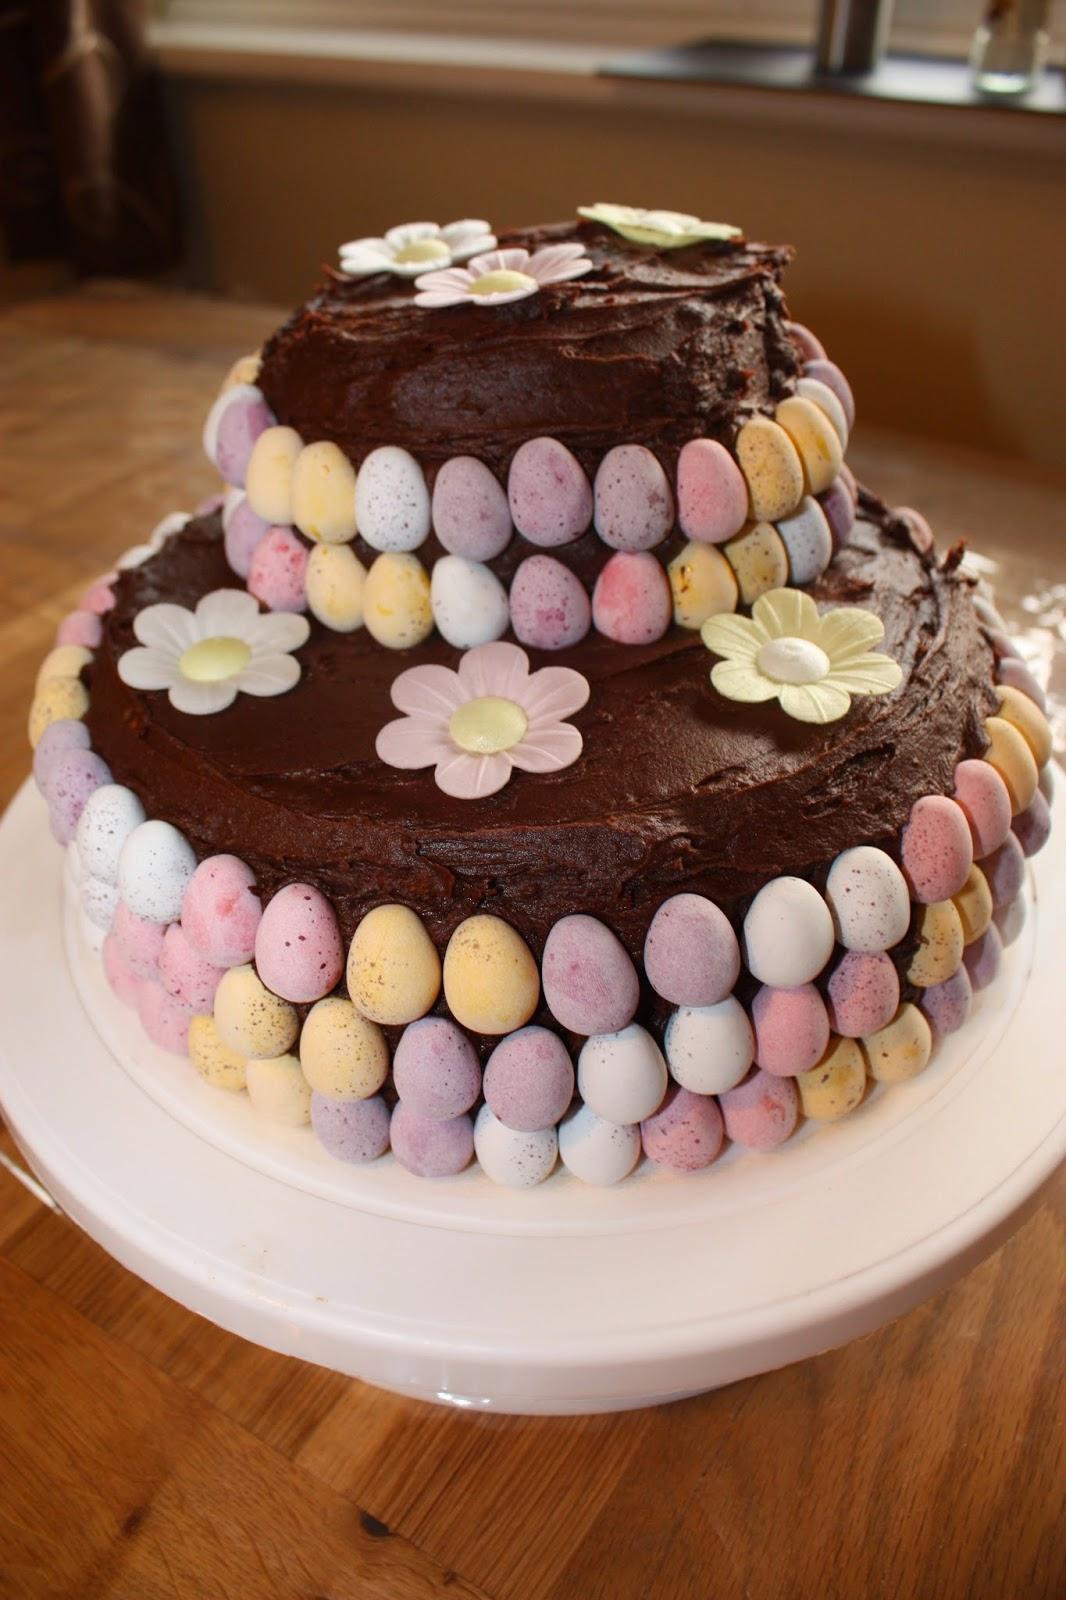 Cadbury Mini Egg Easter Cake With Flowers